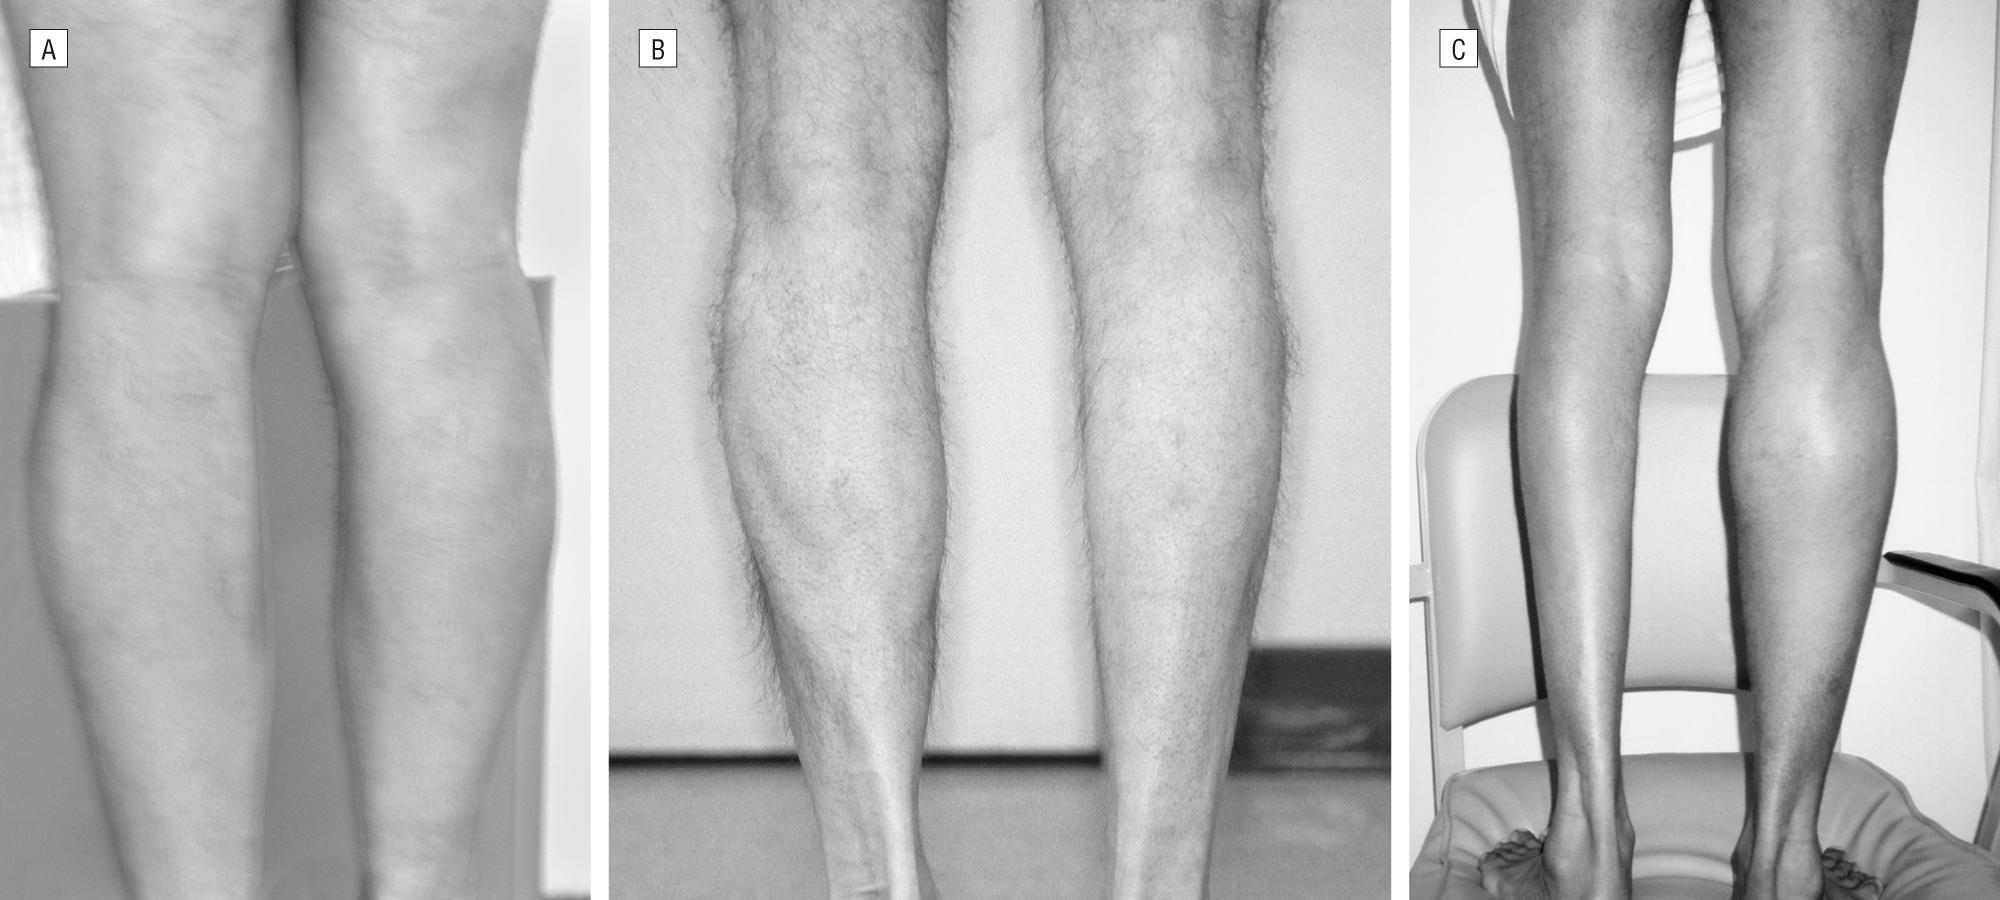 Benign Calf Amyotrophy Clinicopathologic Study Of 8 Patients